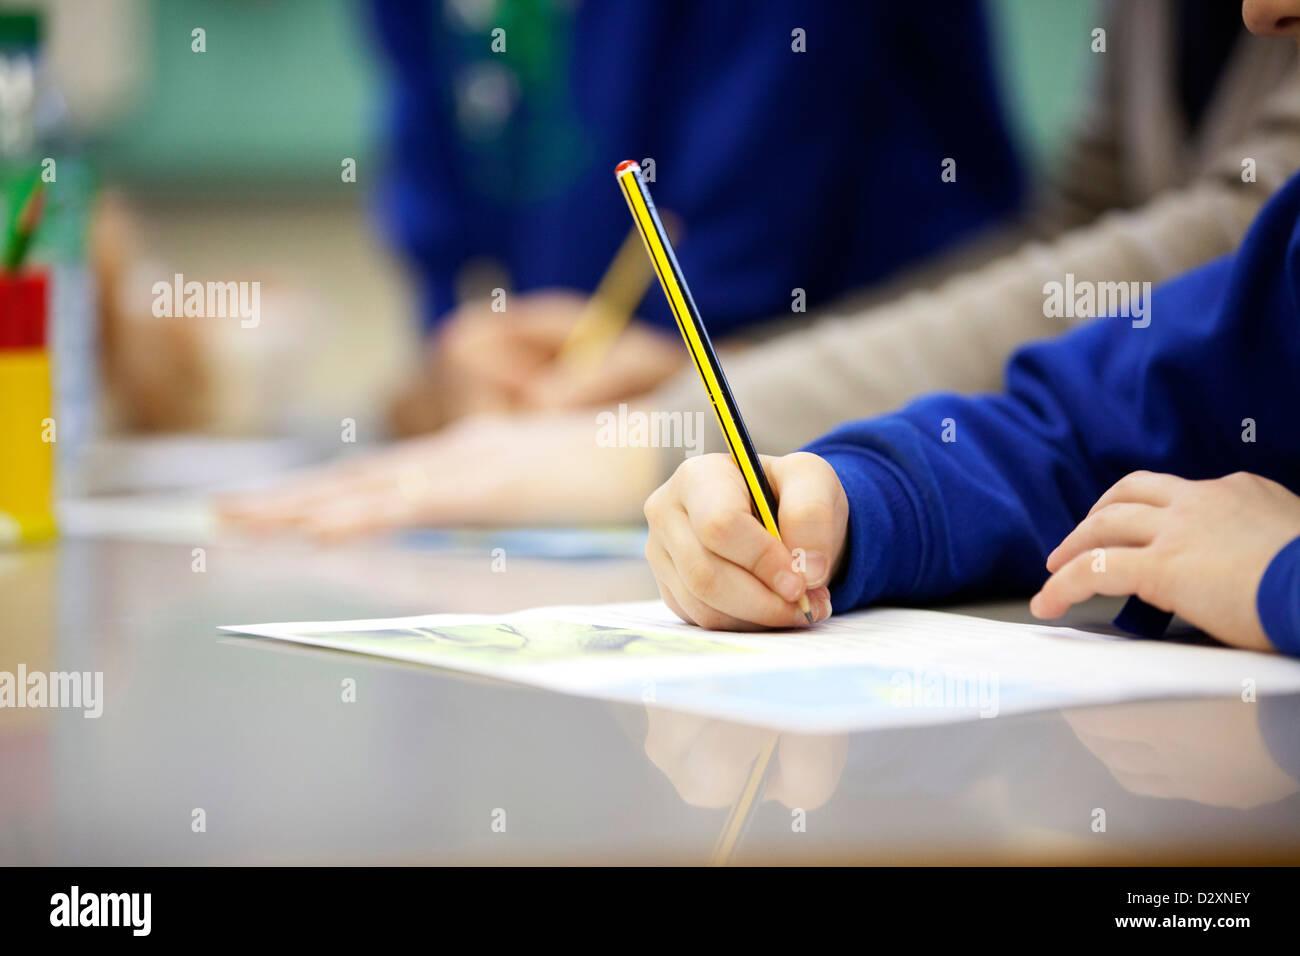 Writing Exercise Stockfotos & Writing Exercise Bilder - Alamy